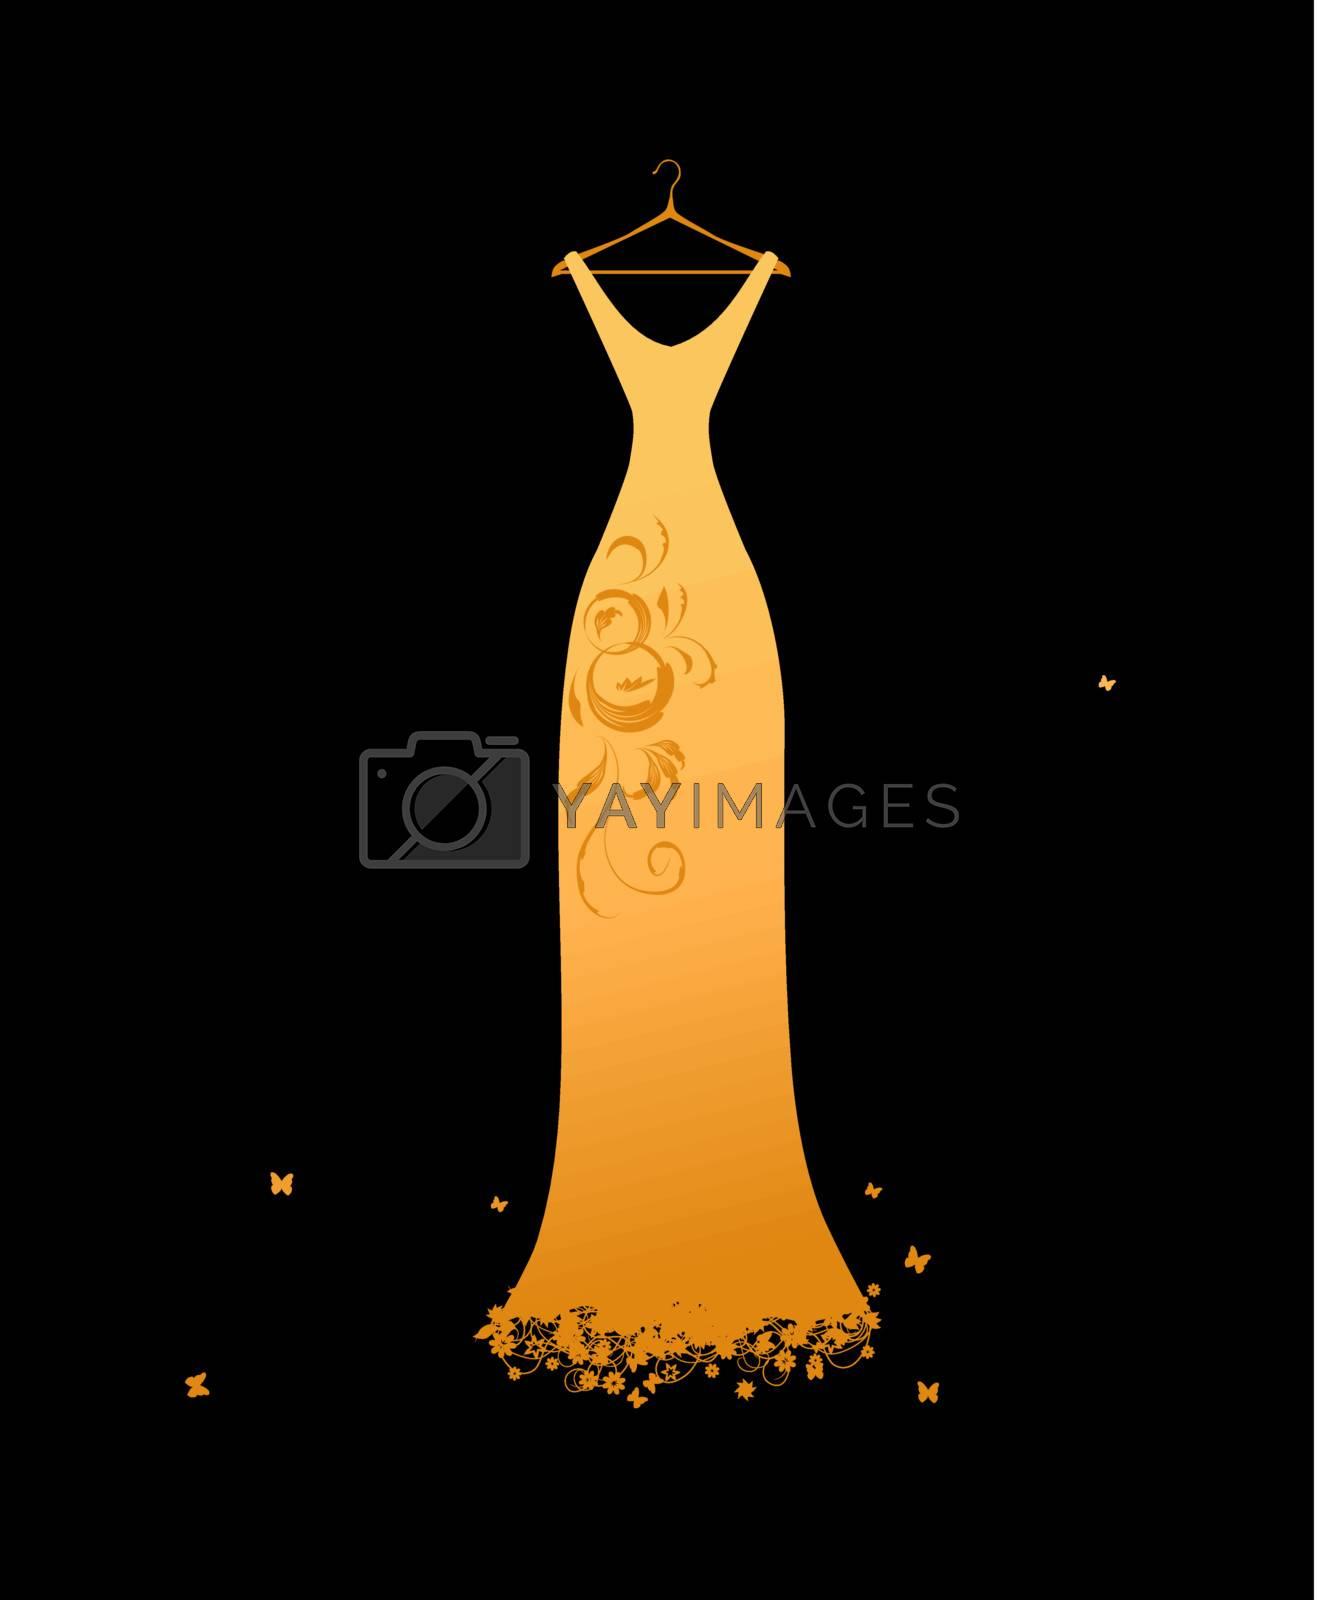 Royalty free image of Evening dress golden on hangers by Kudryashka